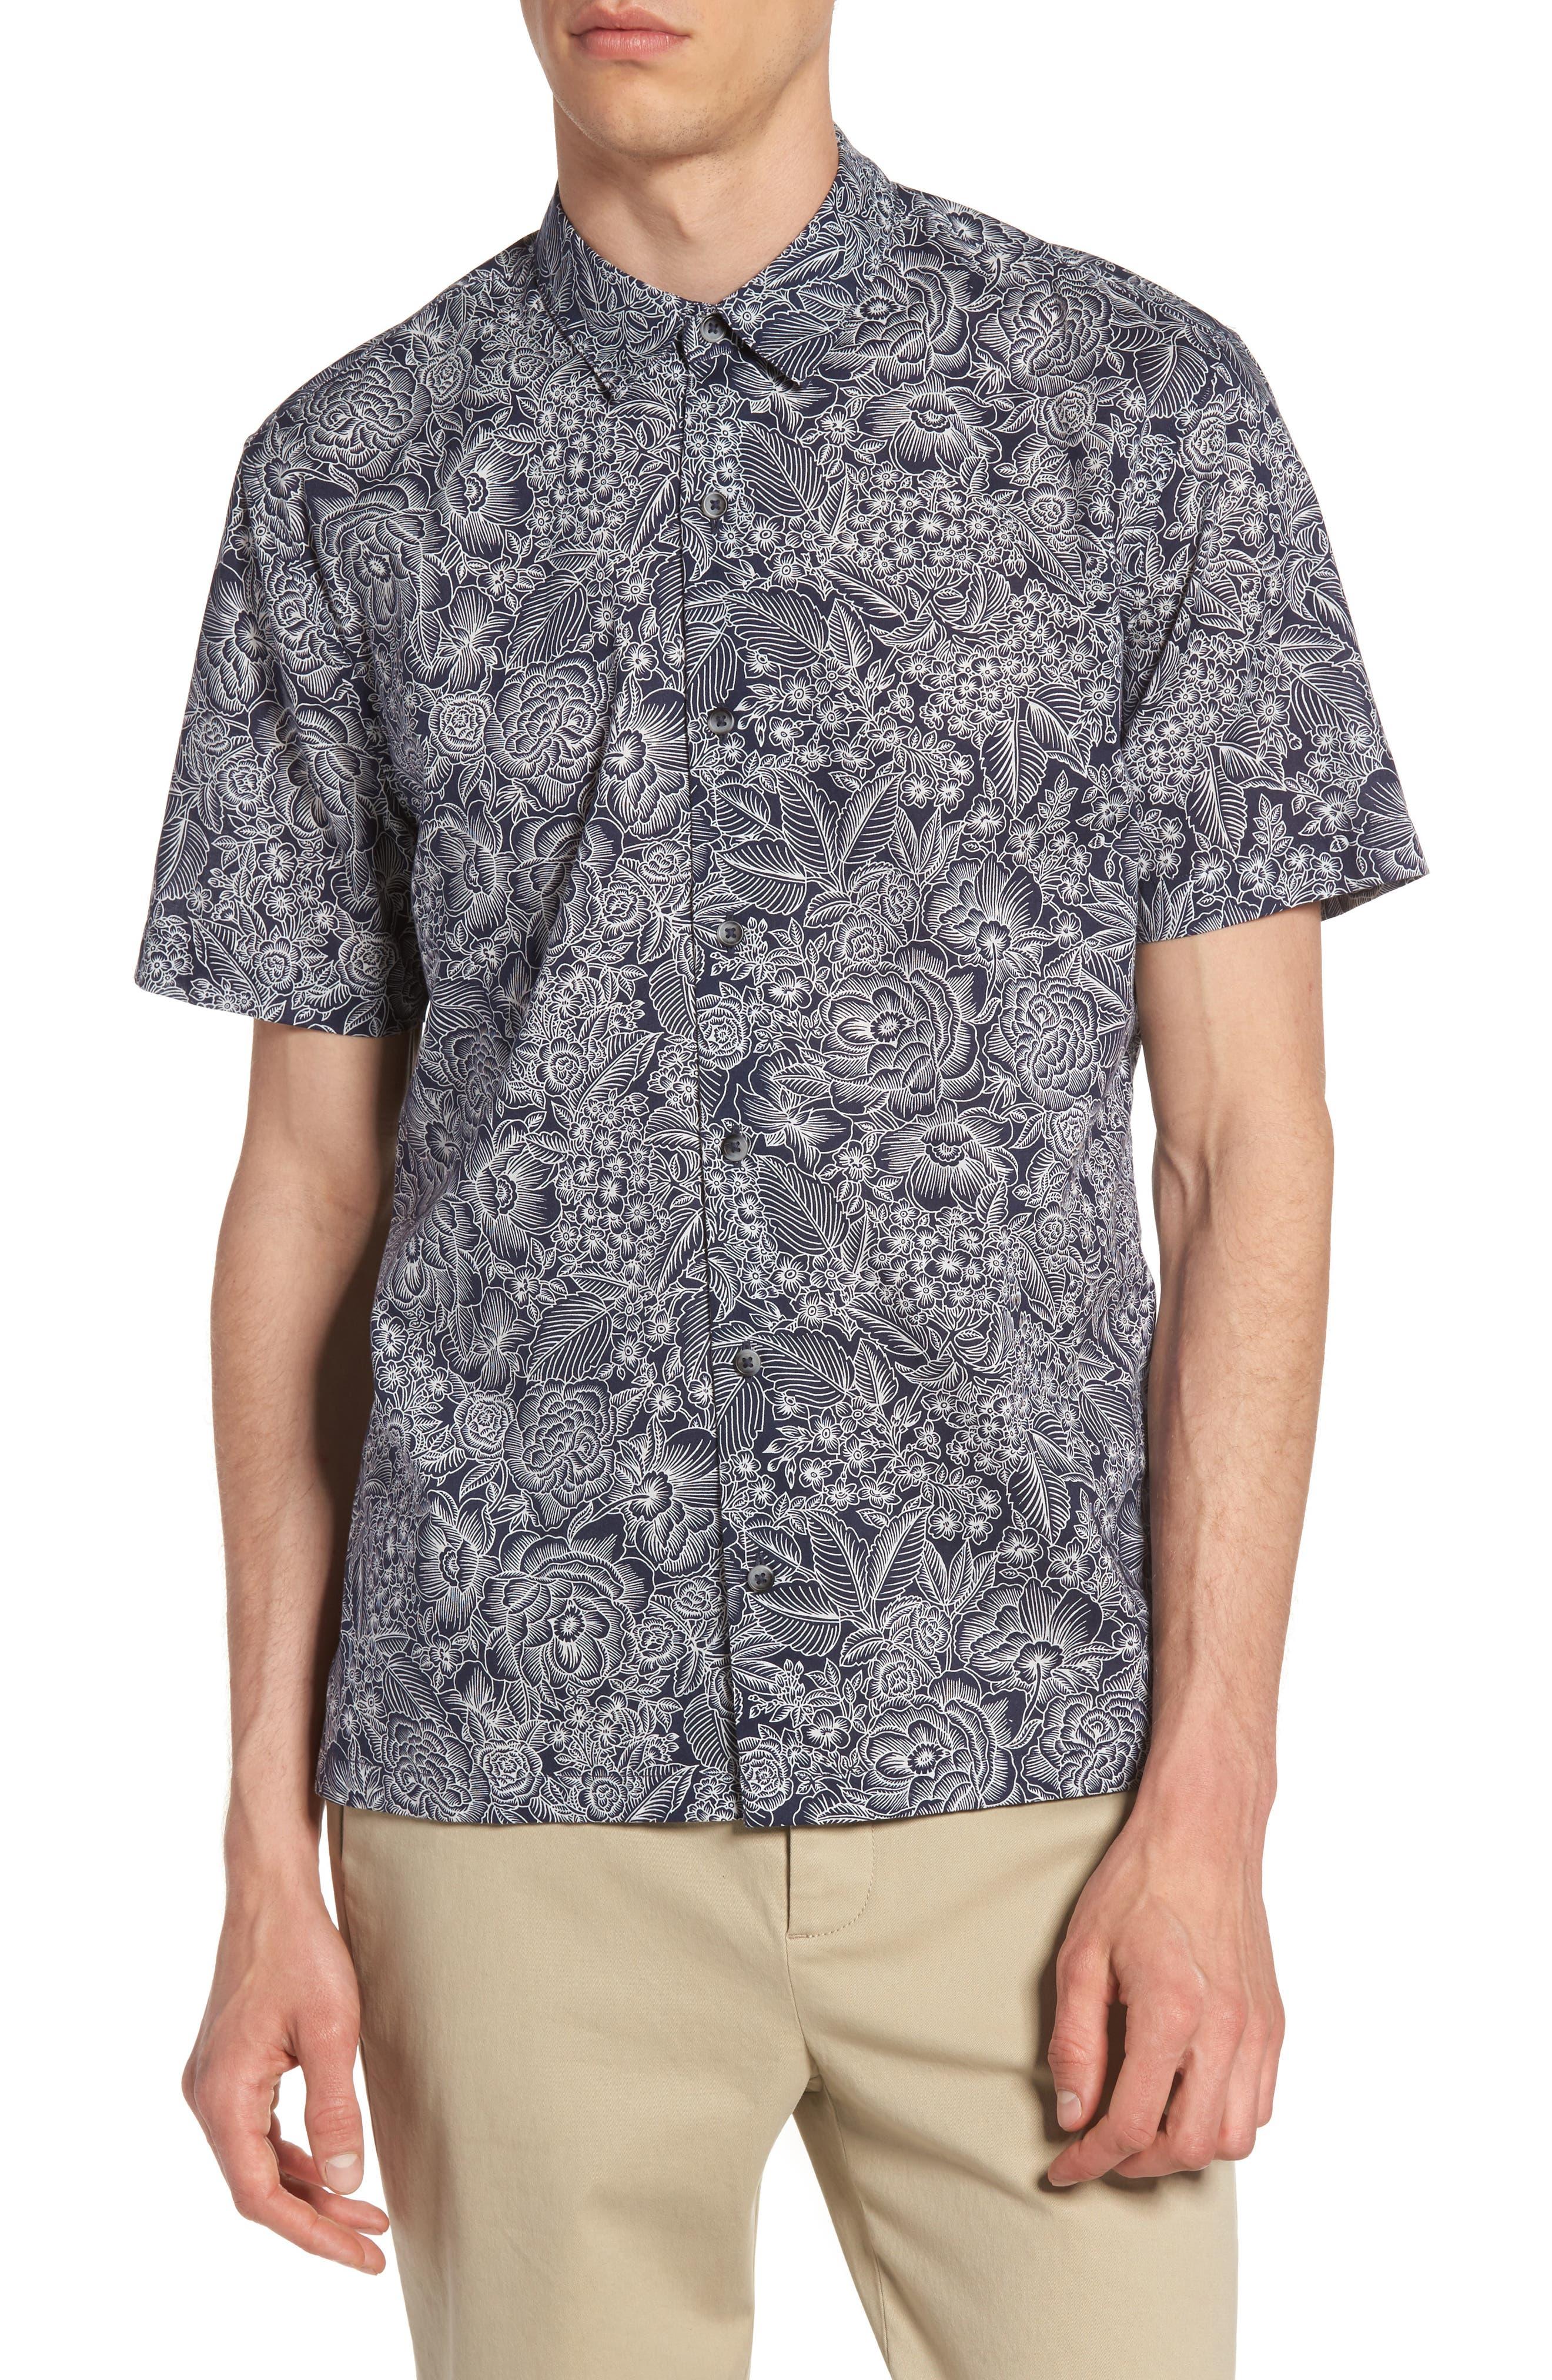 Topman Floral Shirt